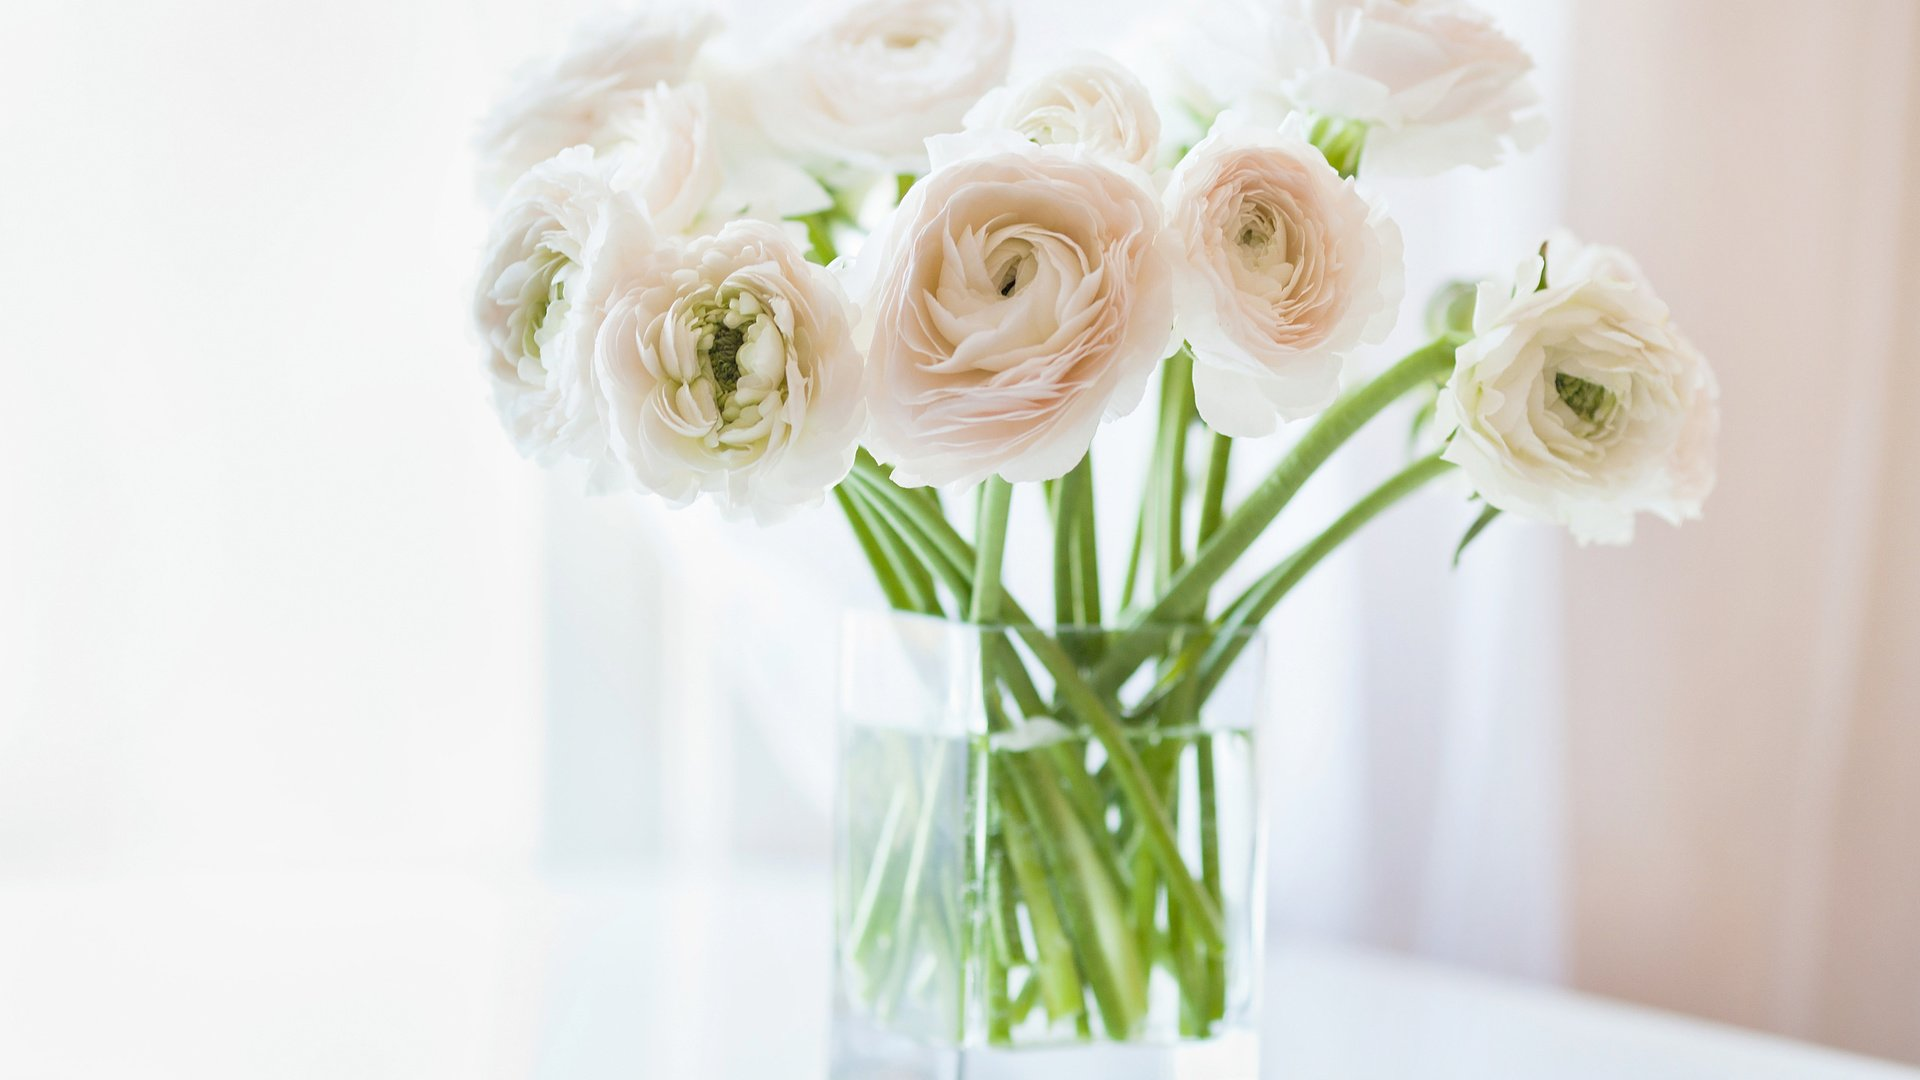 Обои на рабочий стол цветы ранункулюс